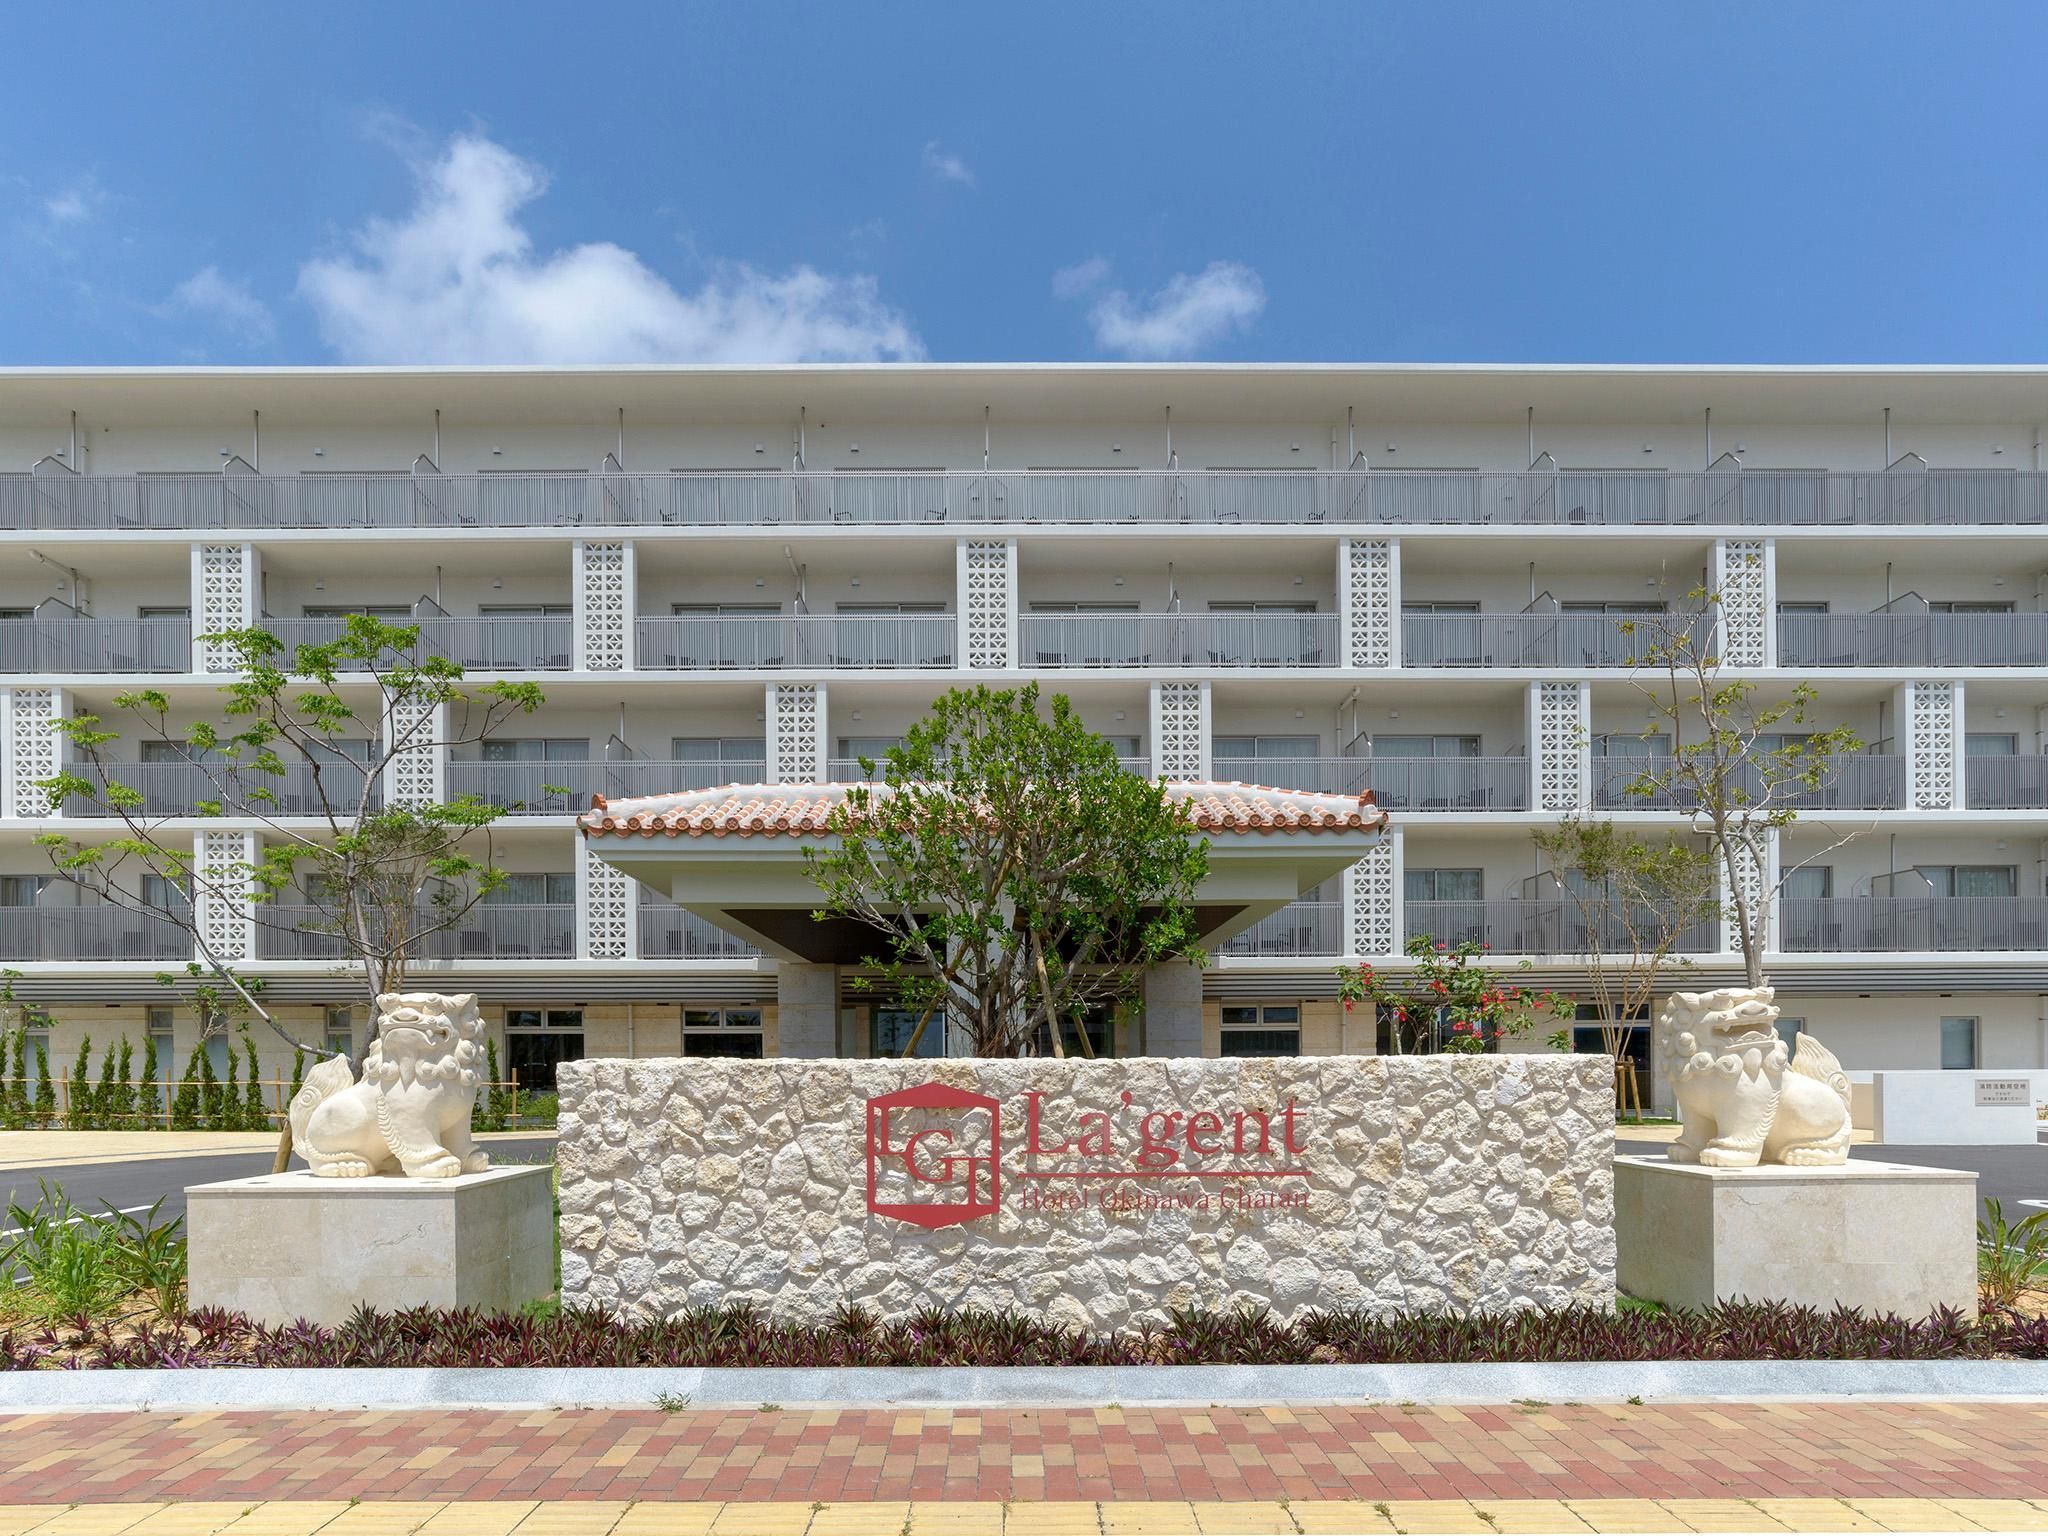 La'gent Hotel Okinawa Chatan Hotel And Hostel